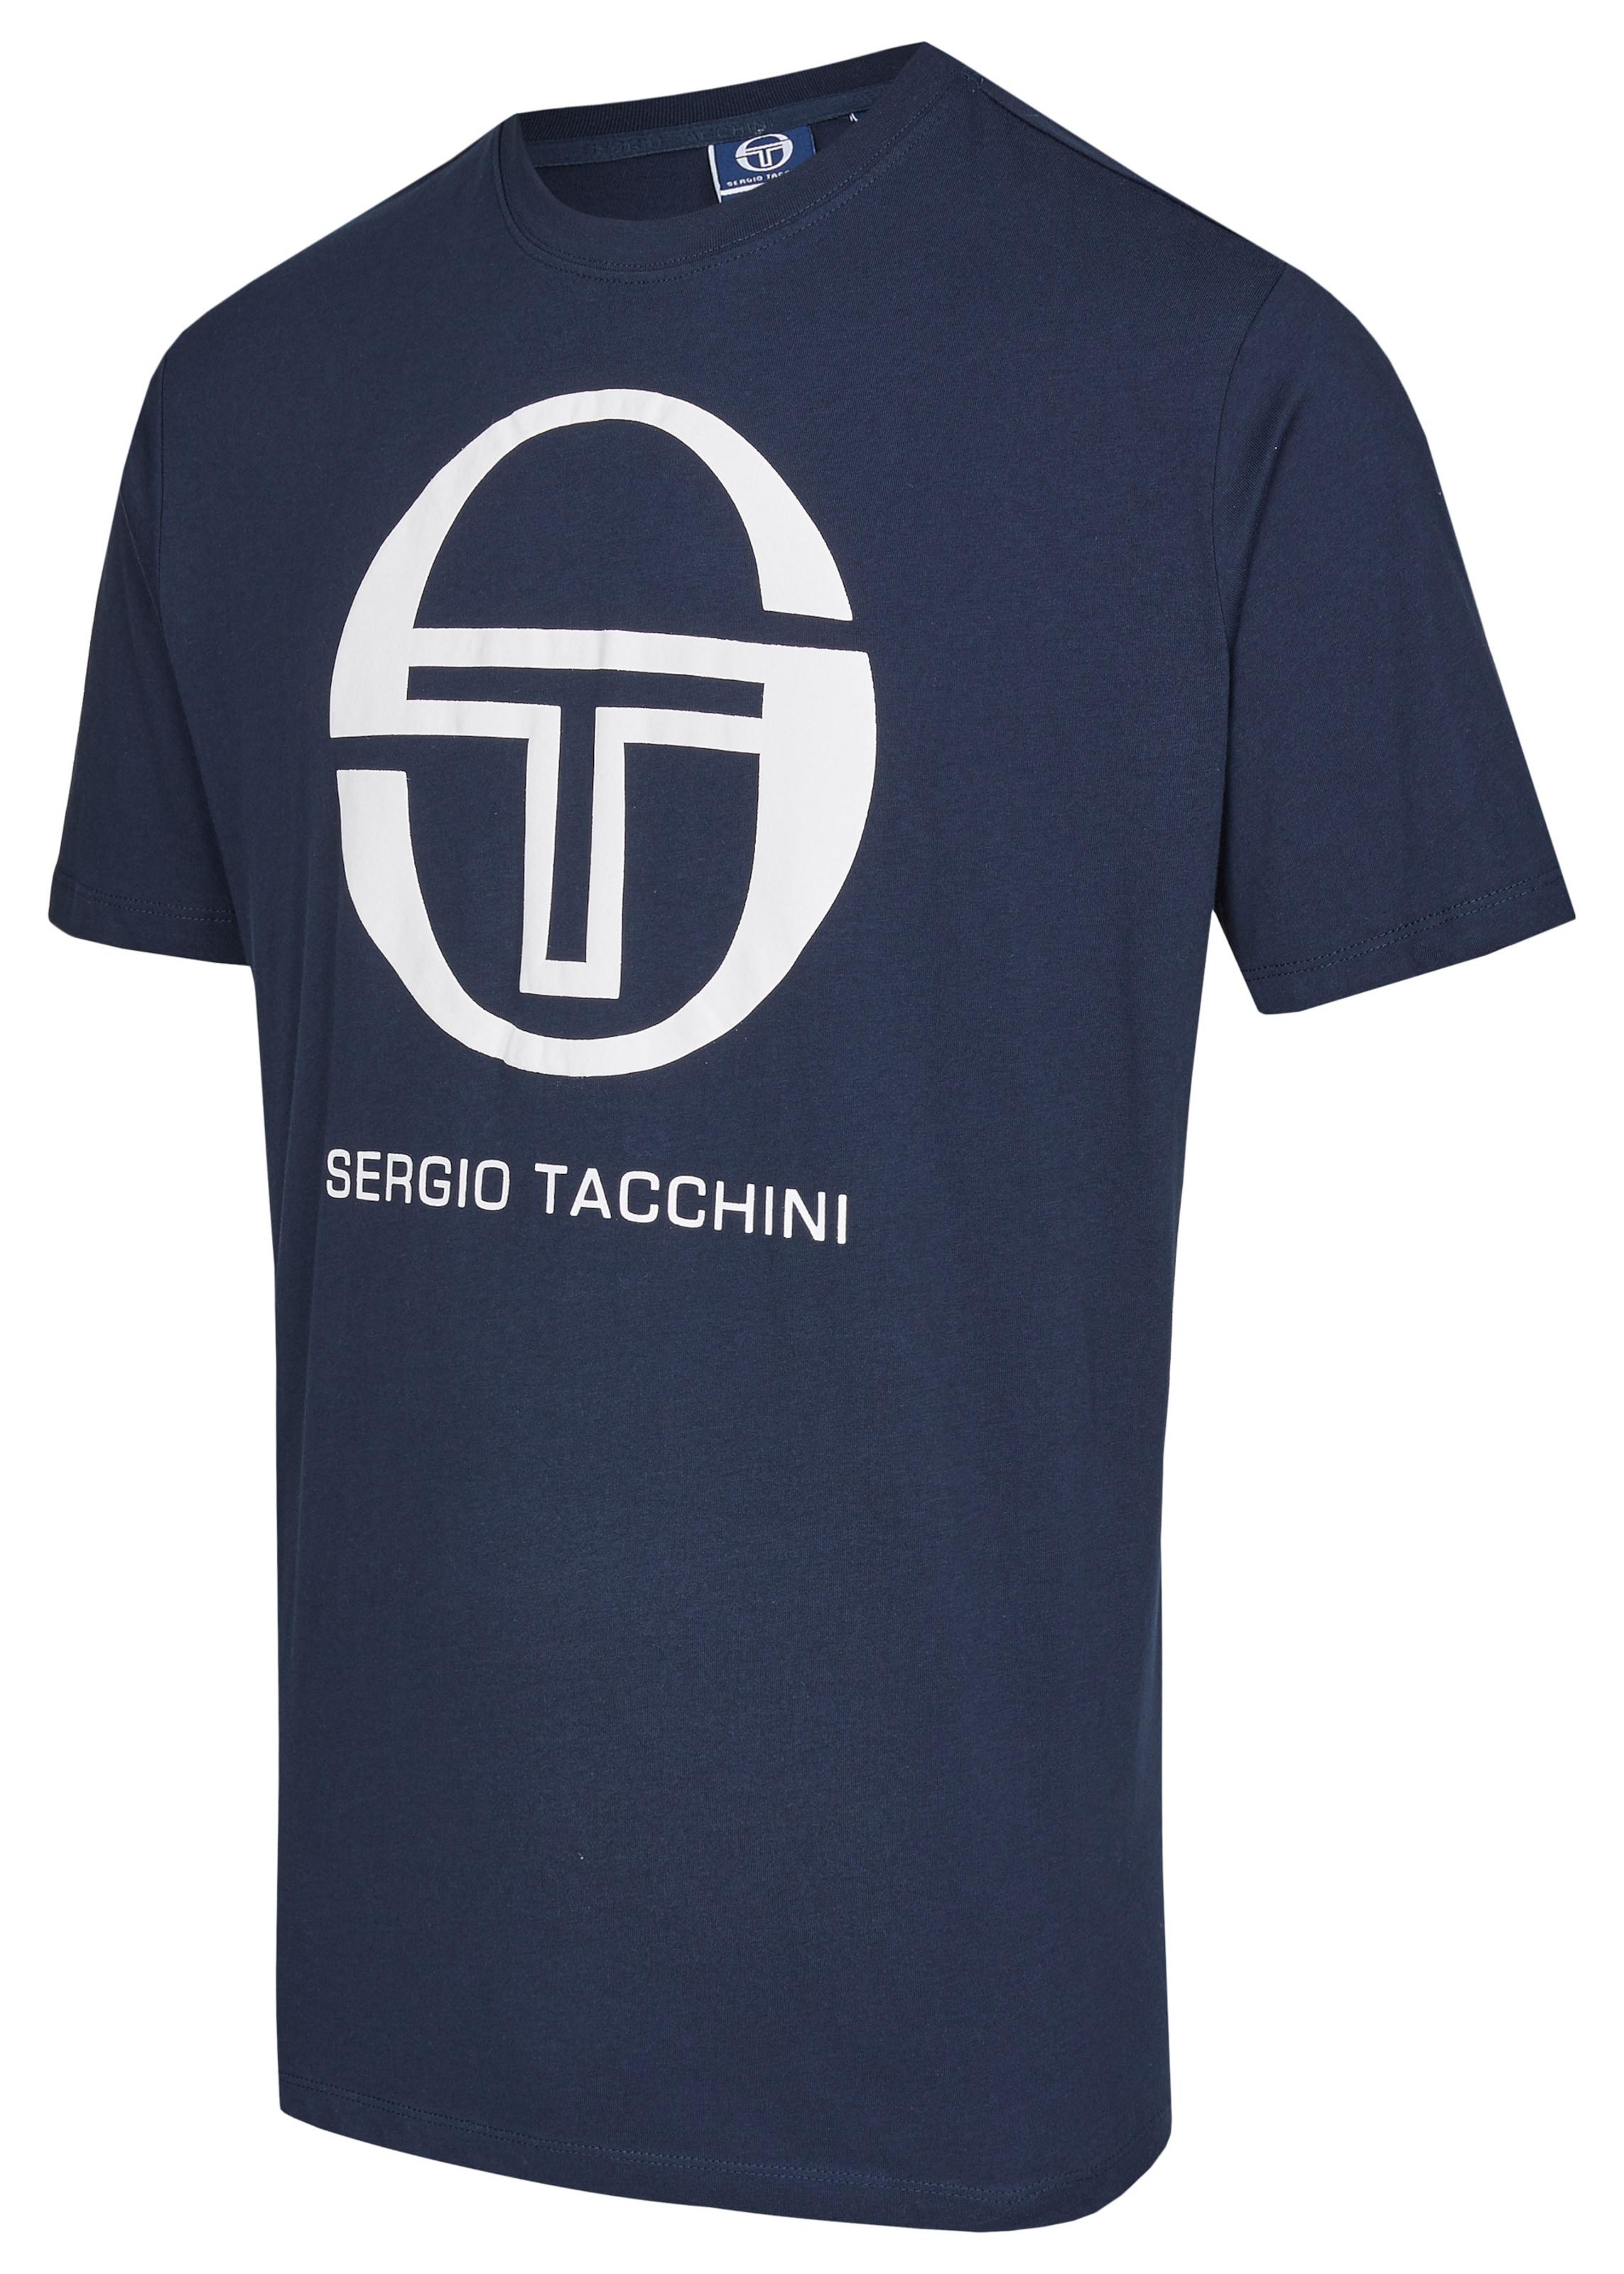 shirt Jersey Tacchini Sergio In BlauWeiß Yyb7g6f